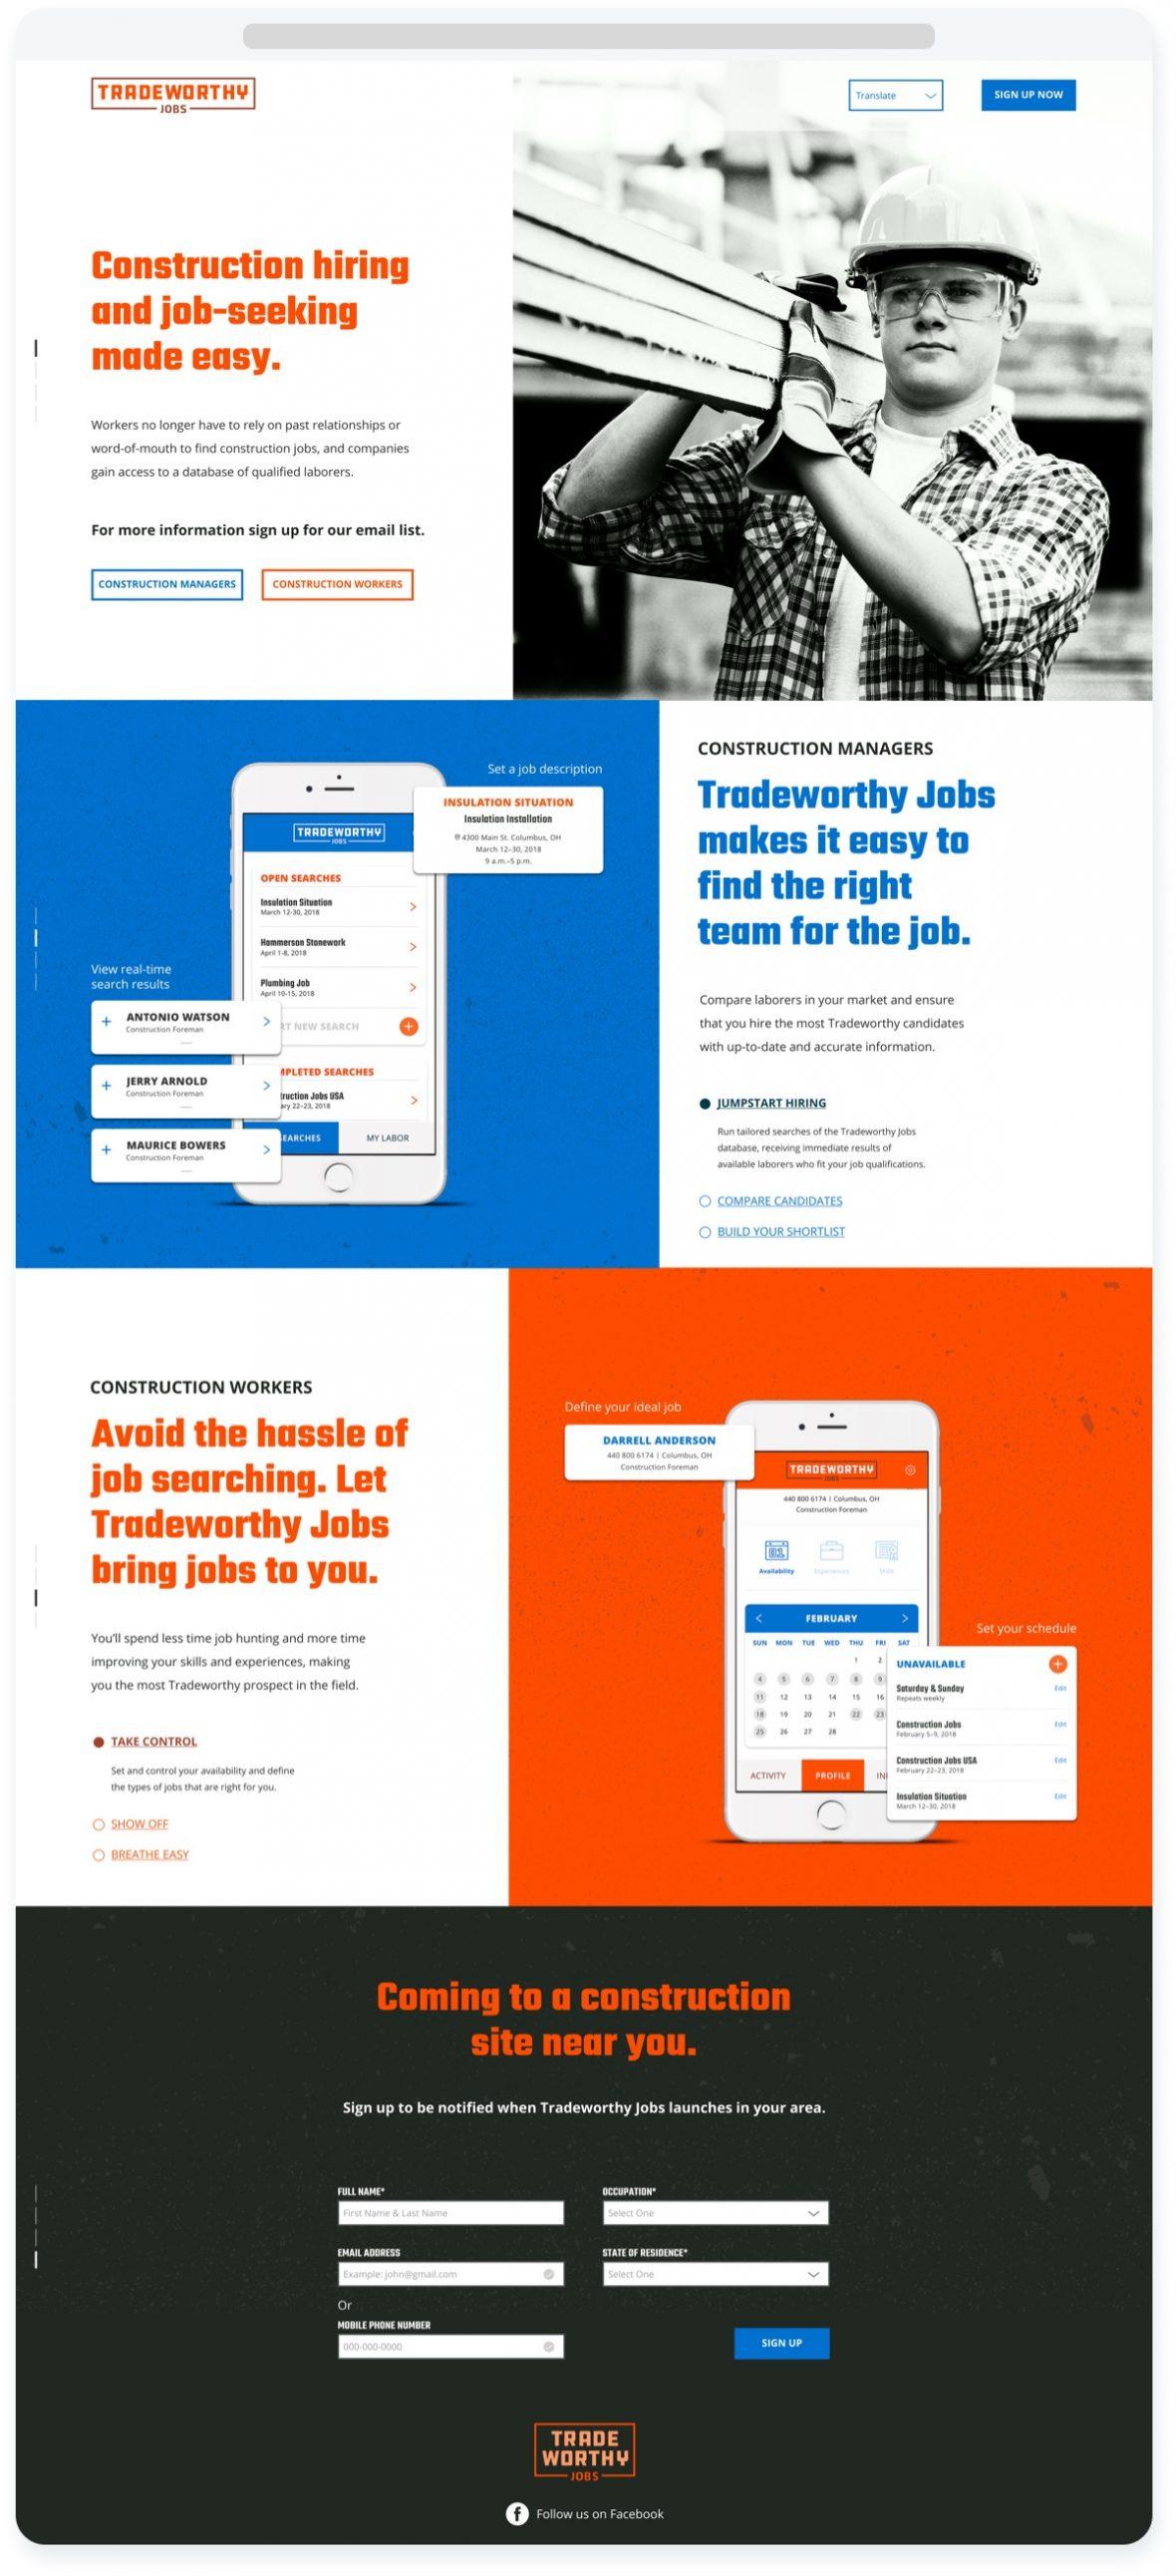 The Tradeworthy Jobs landing page.